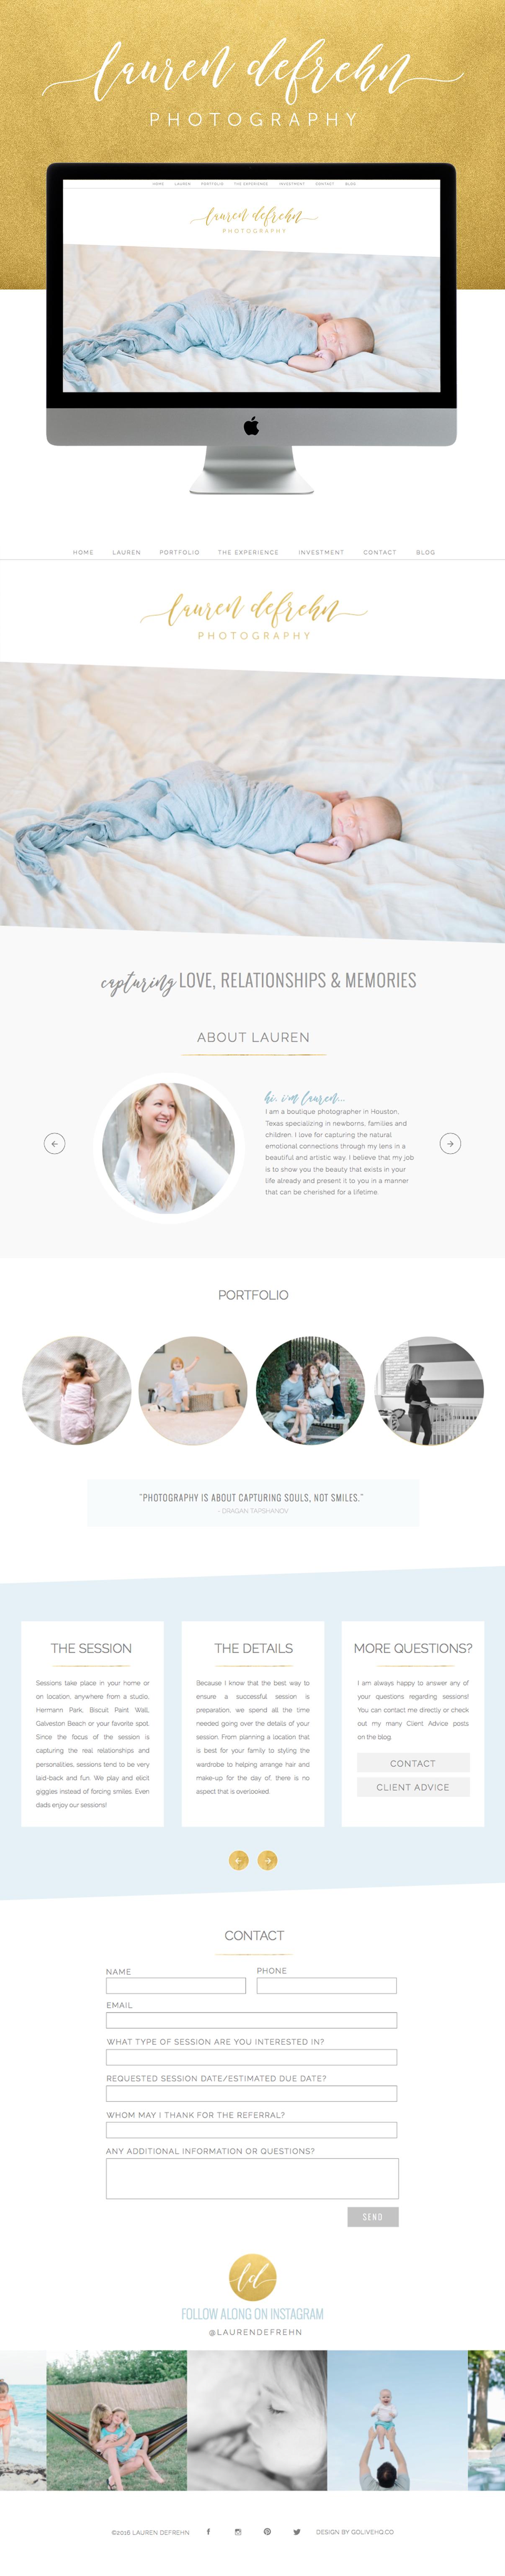 clean and feminine showit website design | designed by: golivehq.co